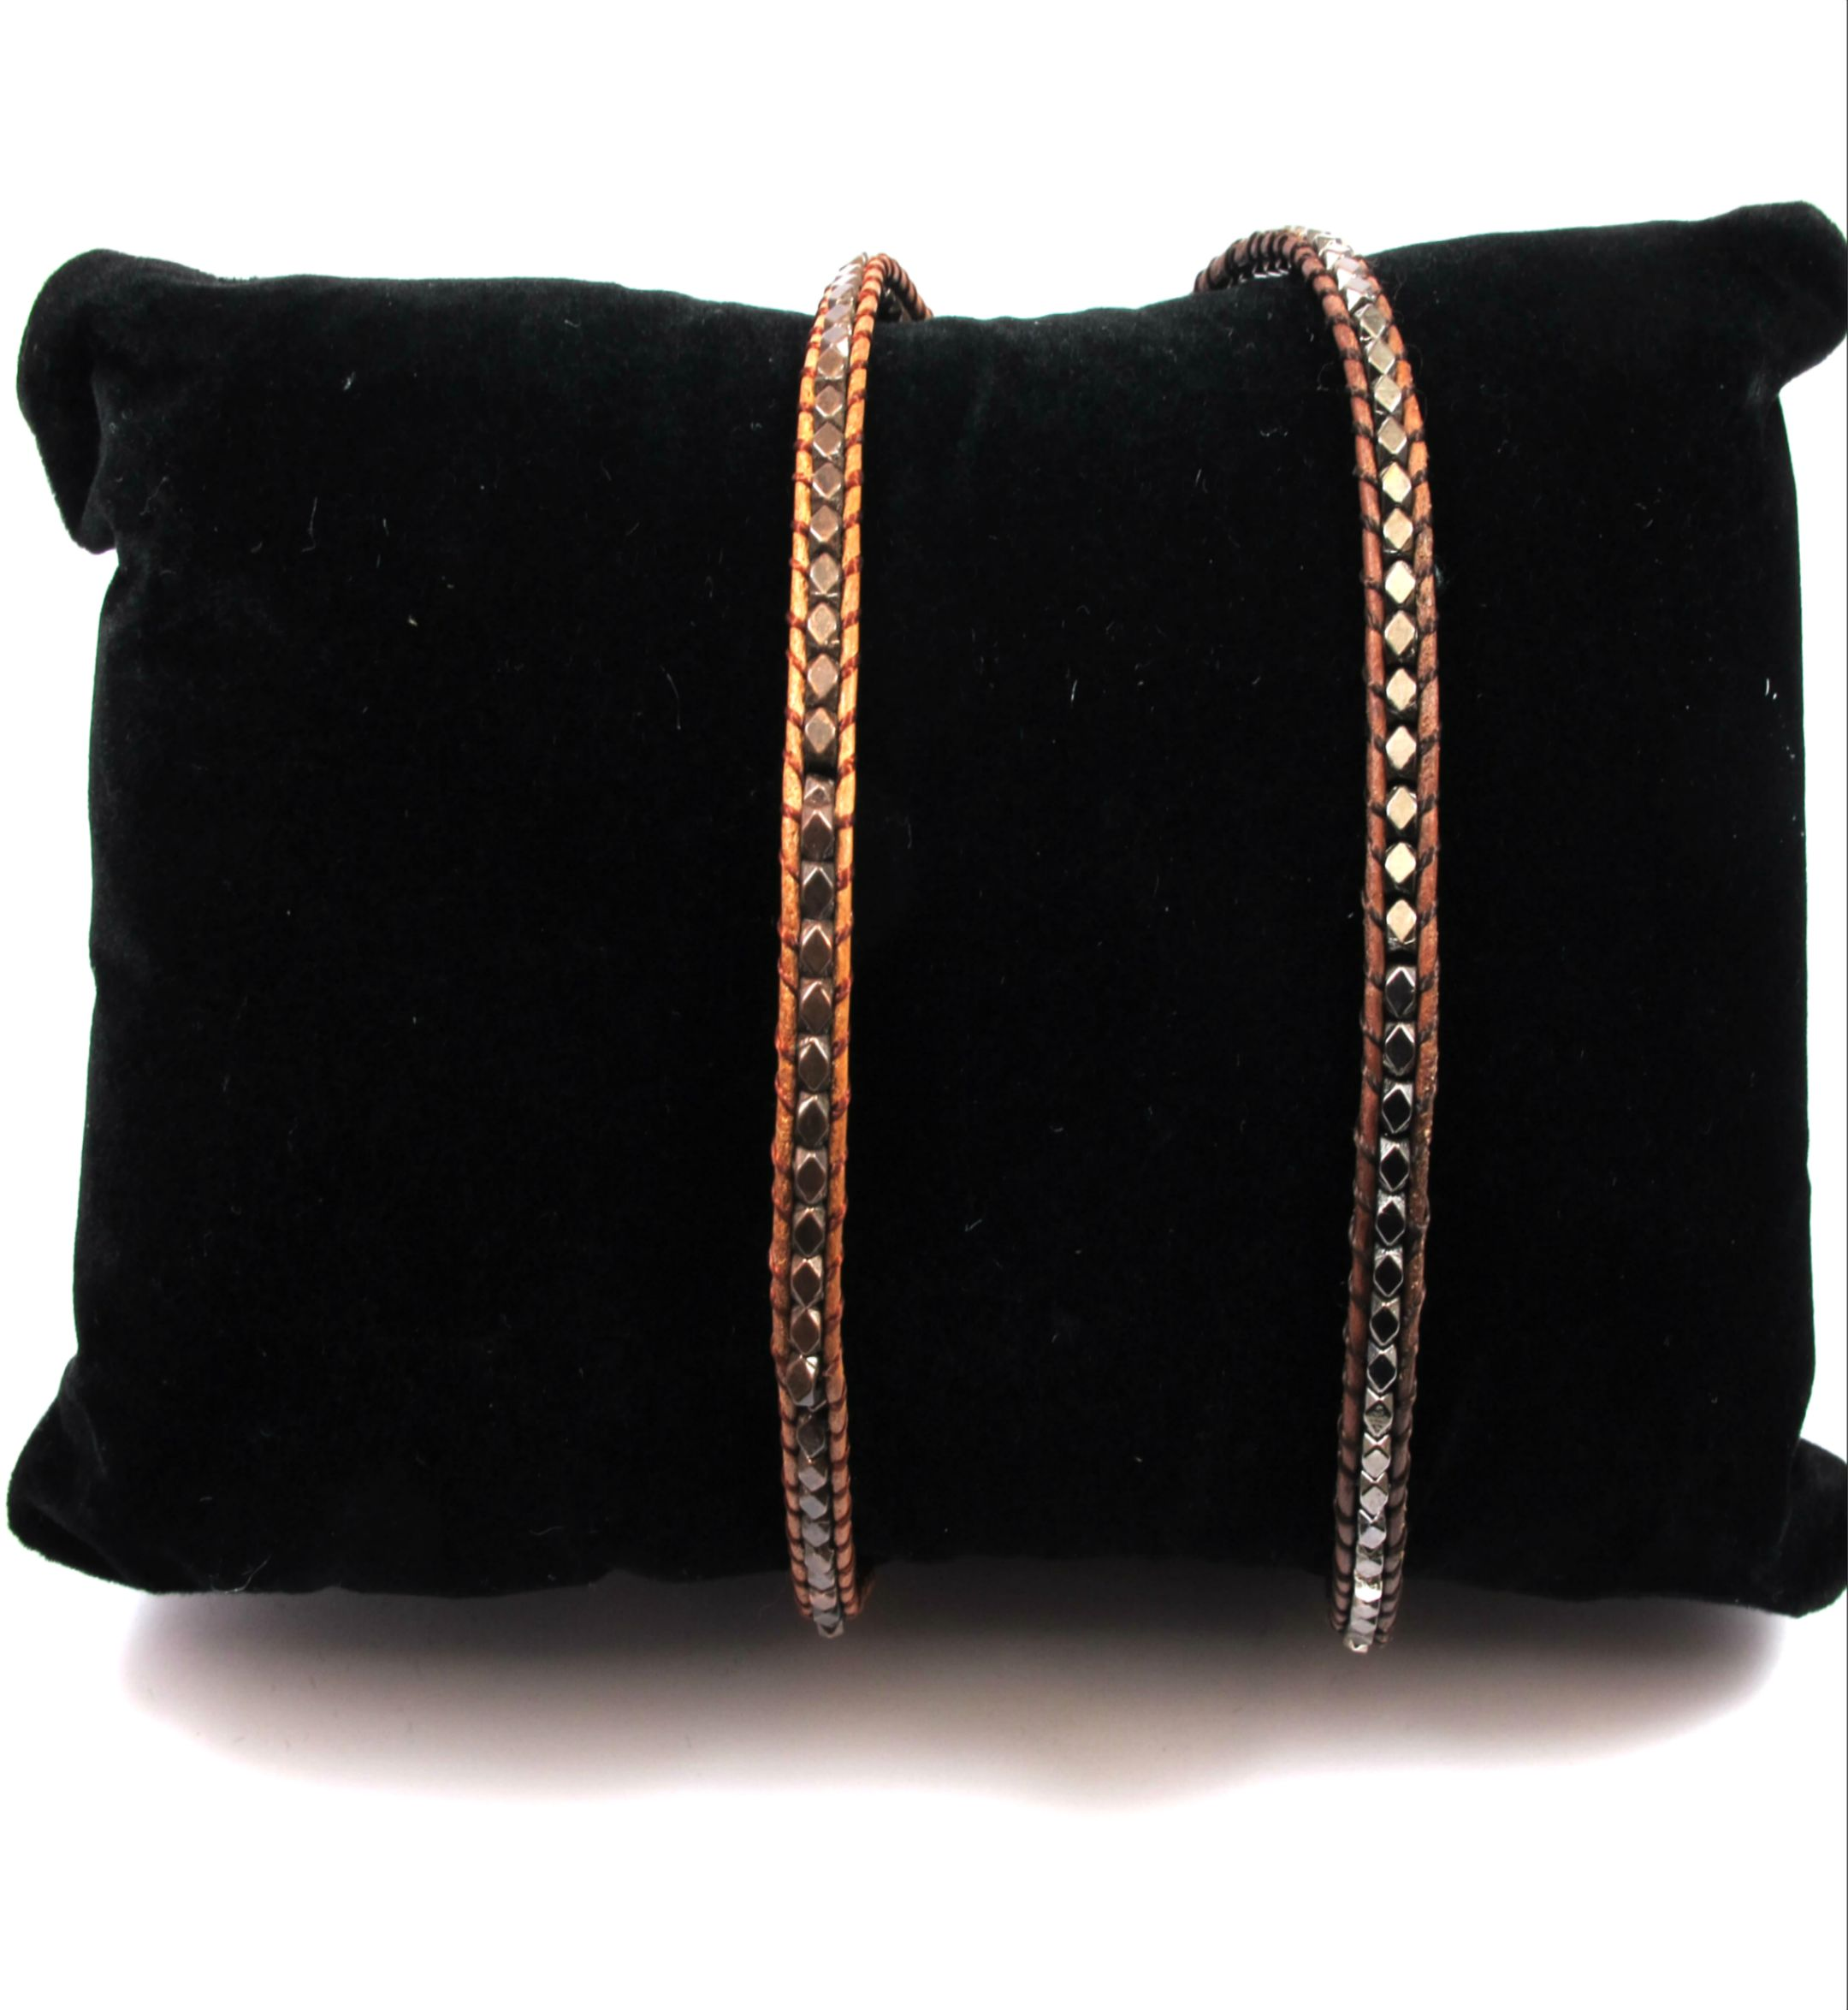 775b3e7cdb Στάντ μαξιλαράκι βελούδινο μαύρο για κοσμήματα - βραχιόλια 175x100mm ...